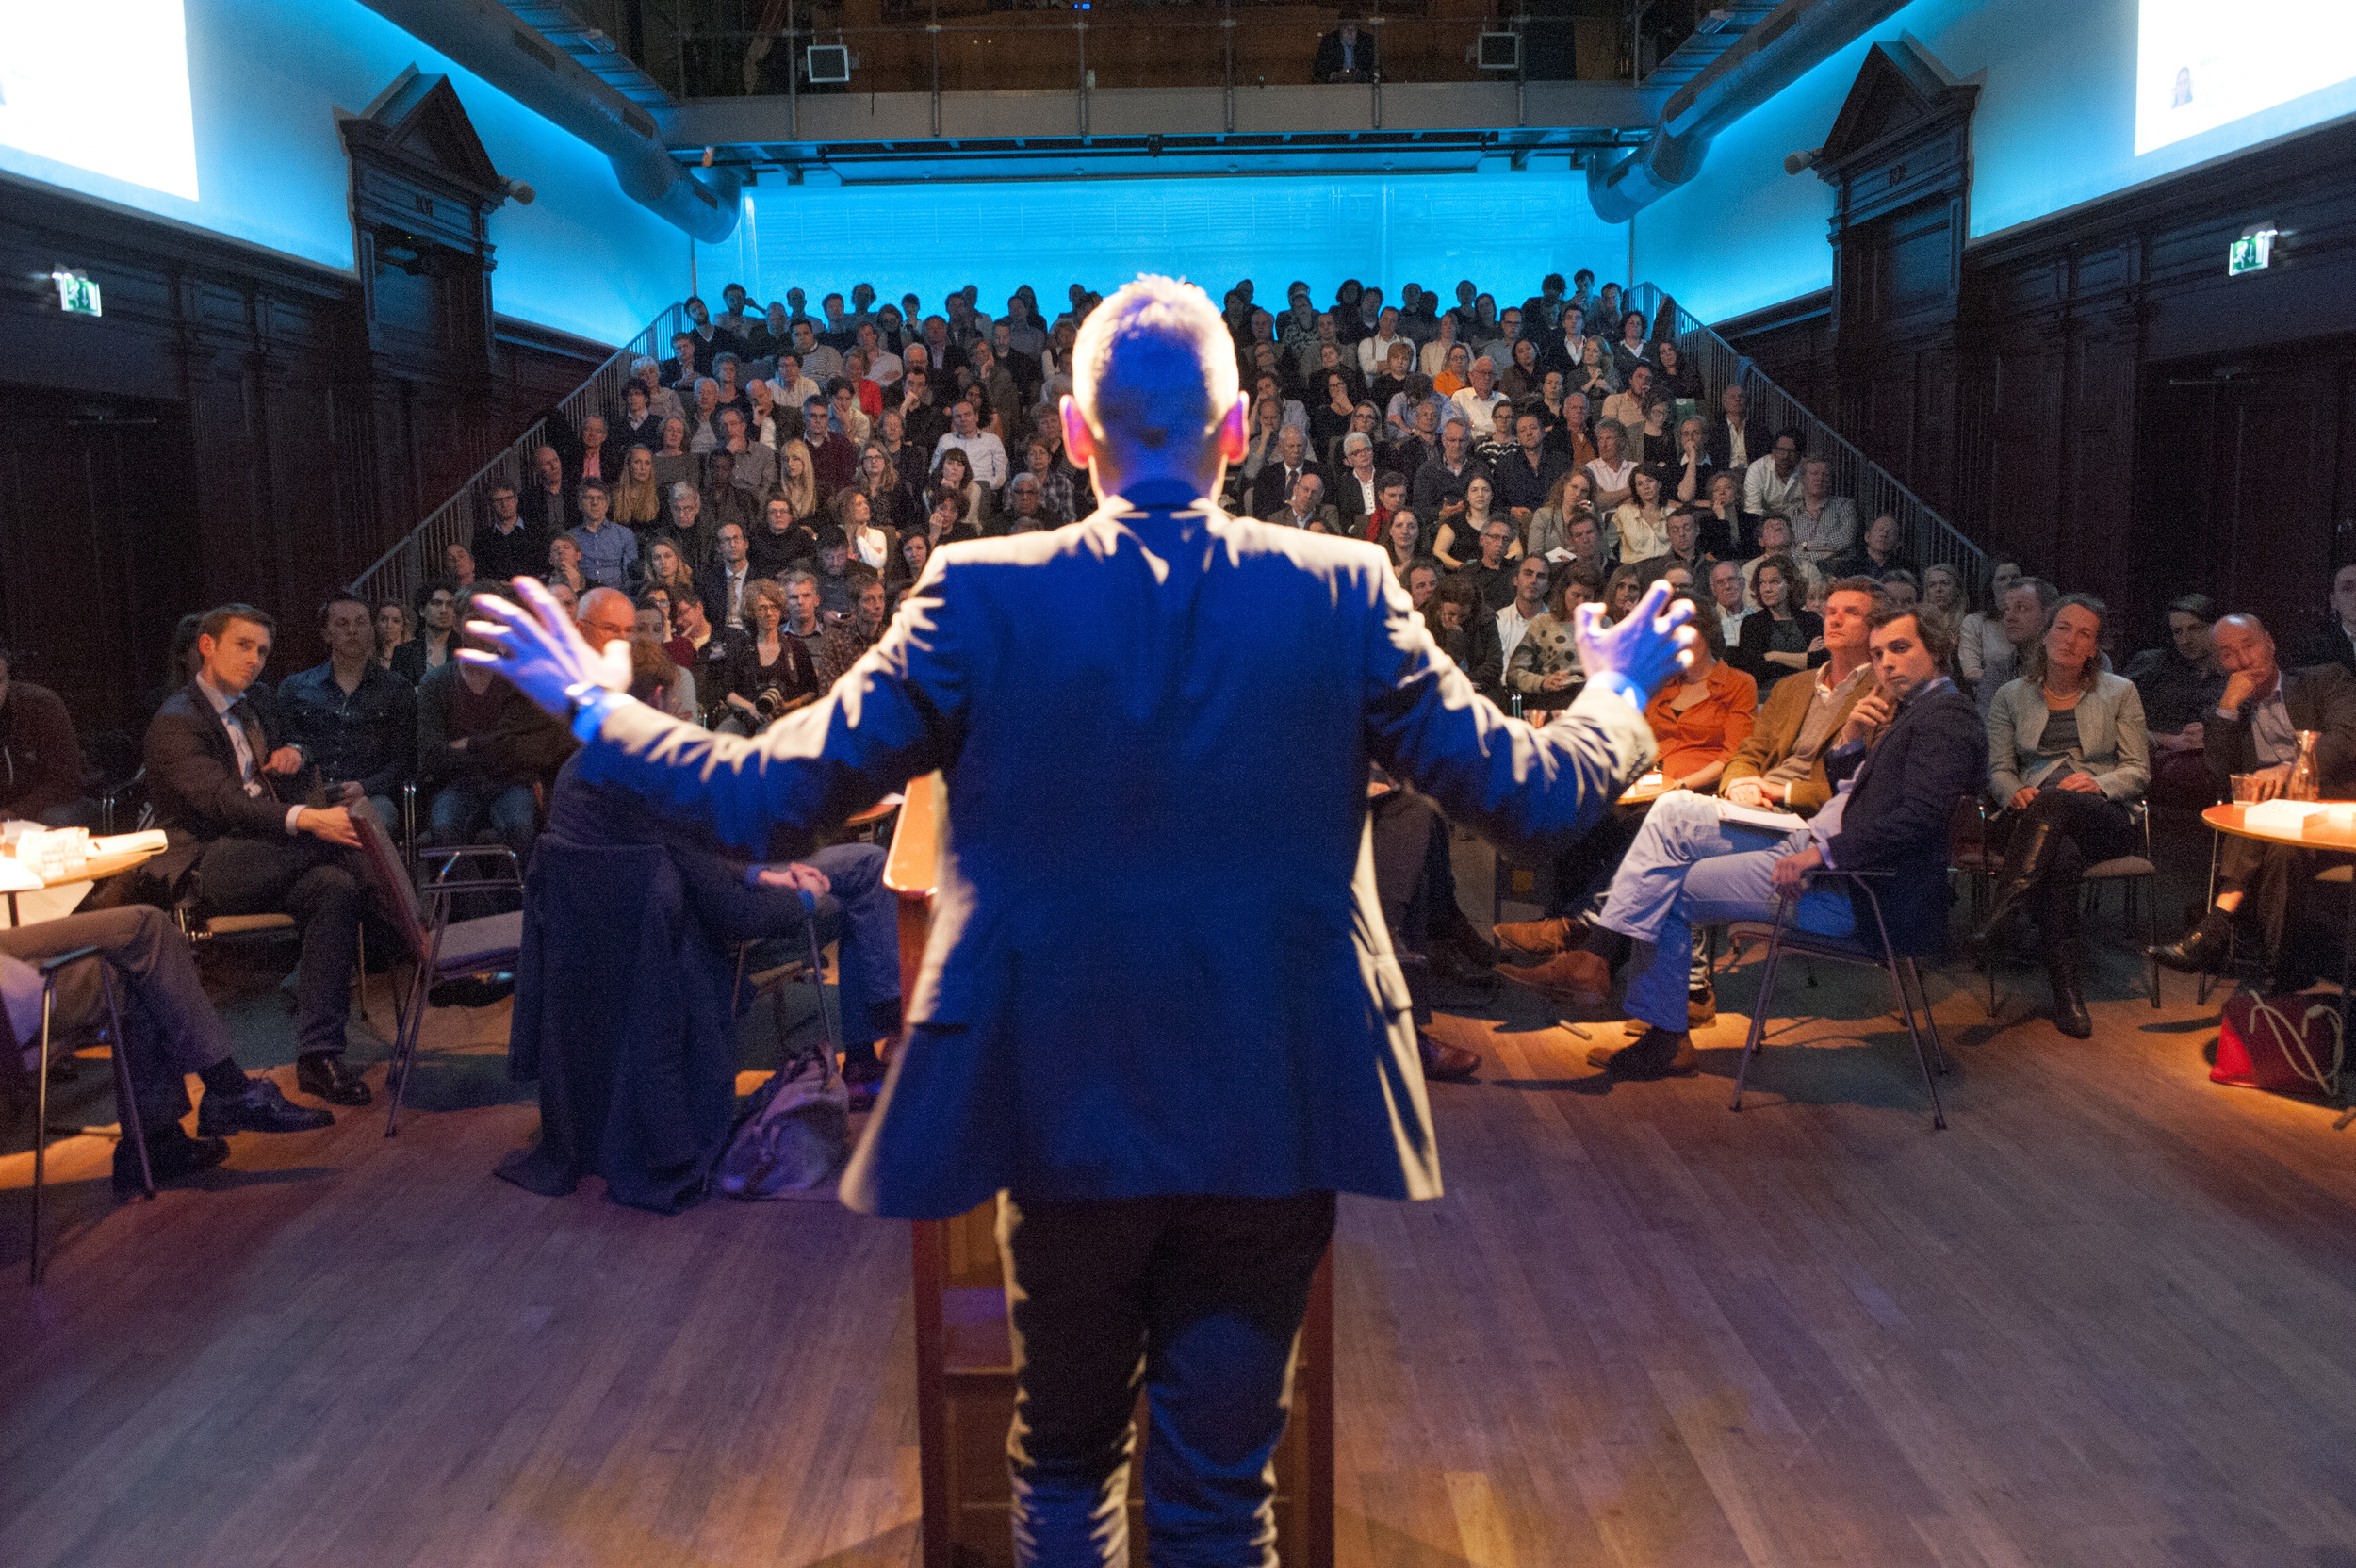 Keynote speaker Philippe Legrain in front of a full room at De Balie, Amsterdam ©Jan Boeve